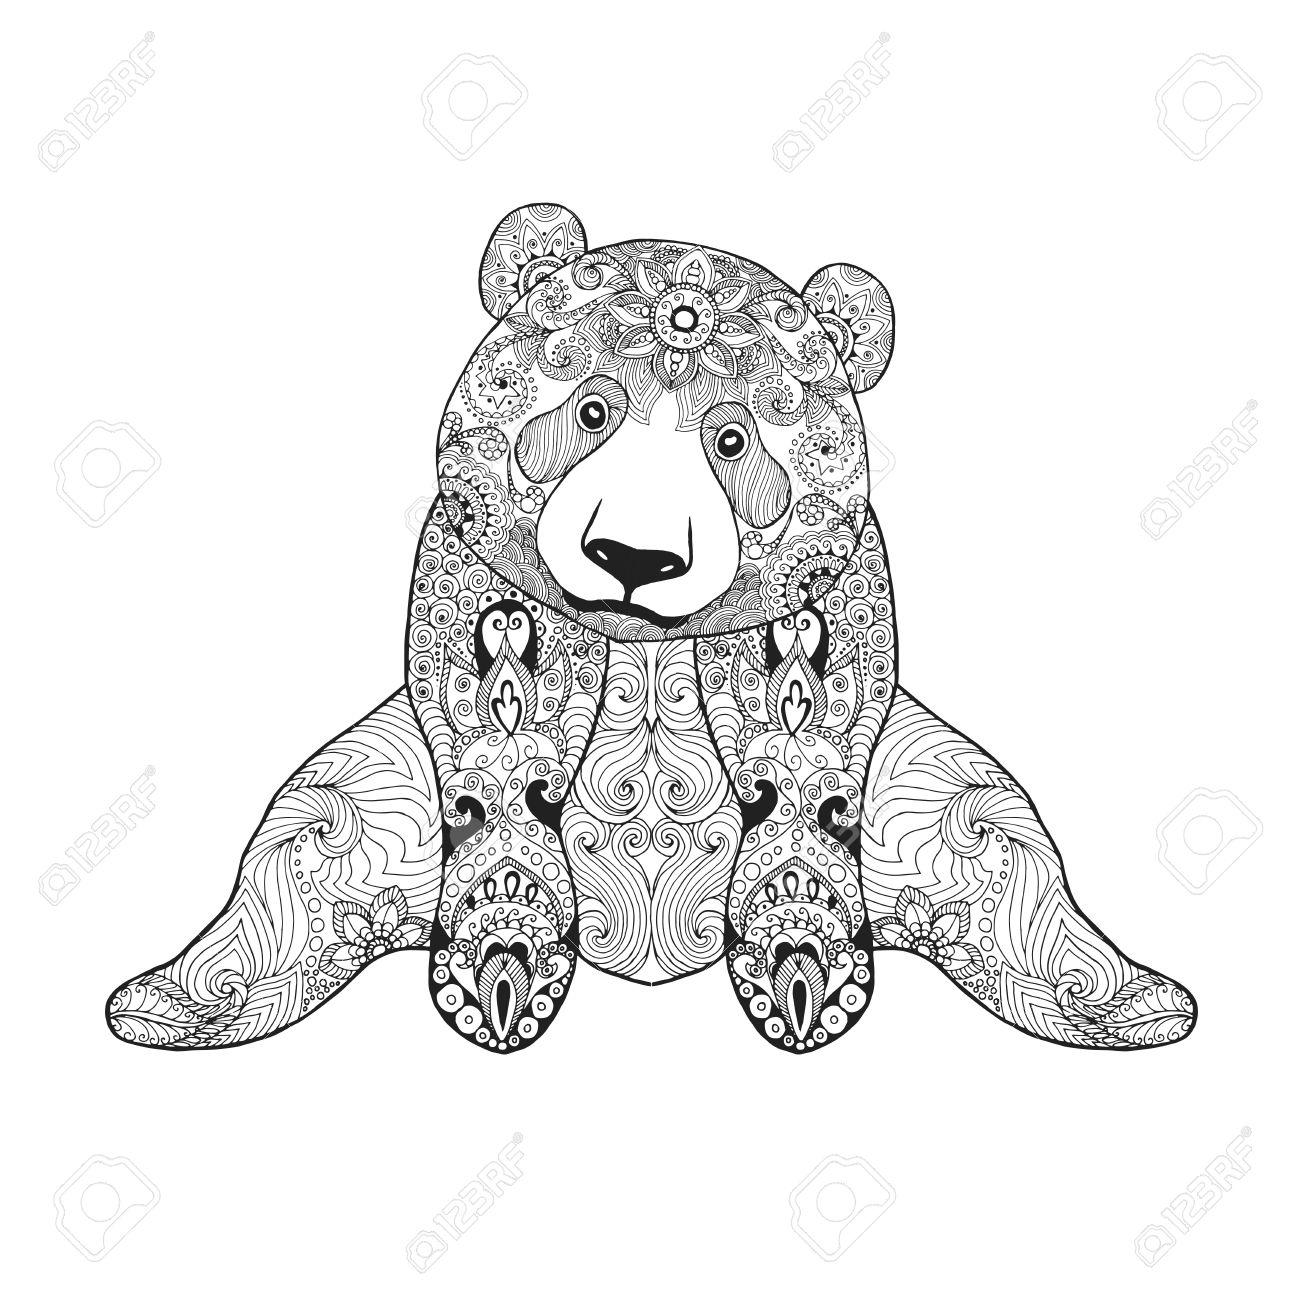 Cute Panda Bear Black White Hand Drawn Doodle Animal Ethnic Patterned Vector Illustration